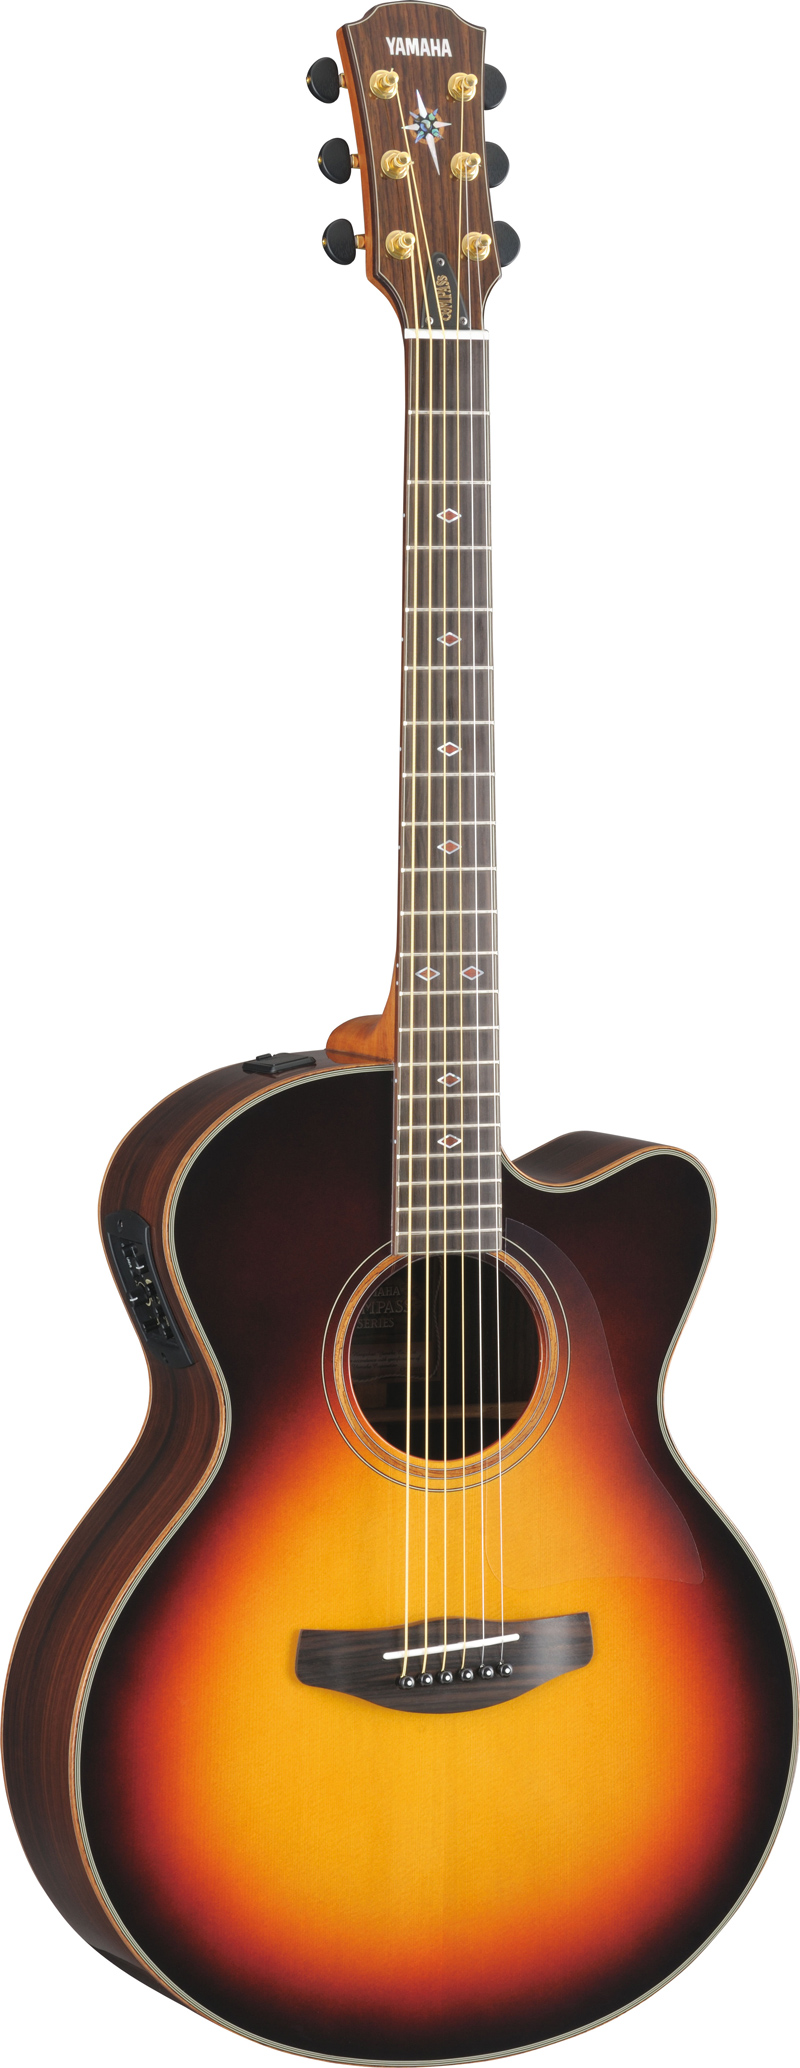 yamaha cpx1200ii vsb compass elektro akustik gitarre bag. Black Bedroom Furniture Sets. Home Design Ideas